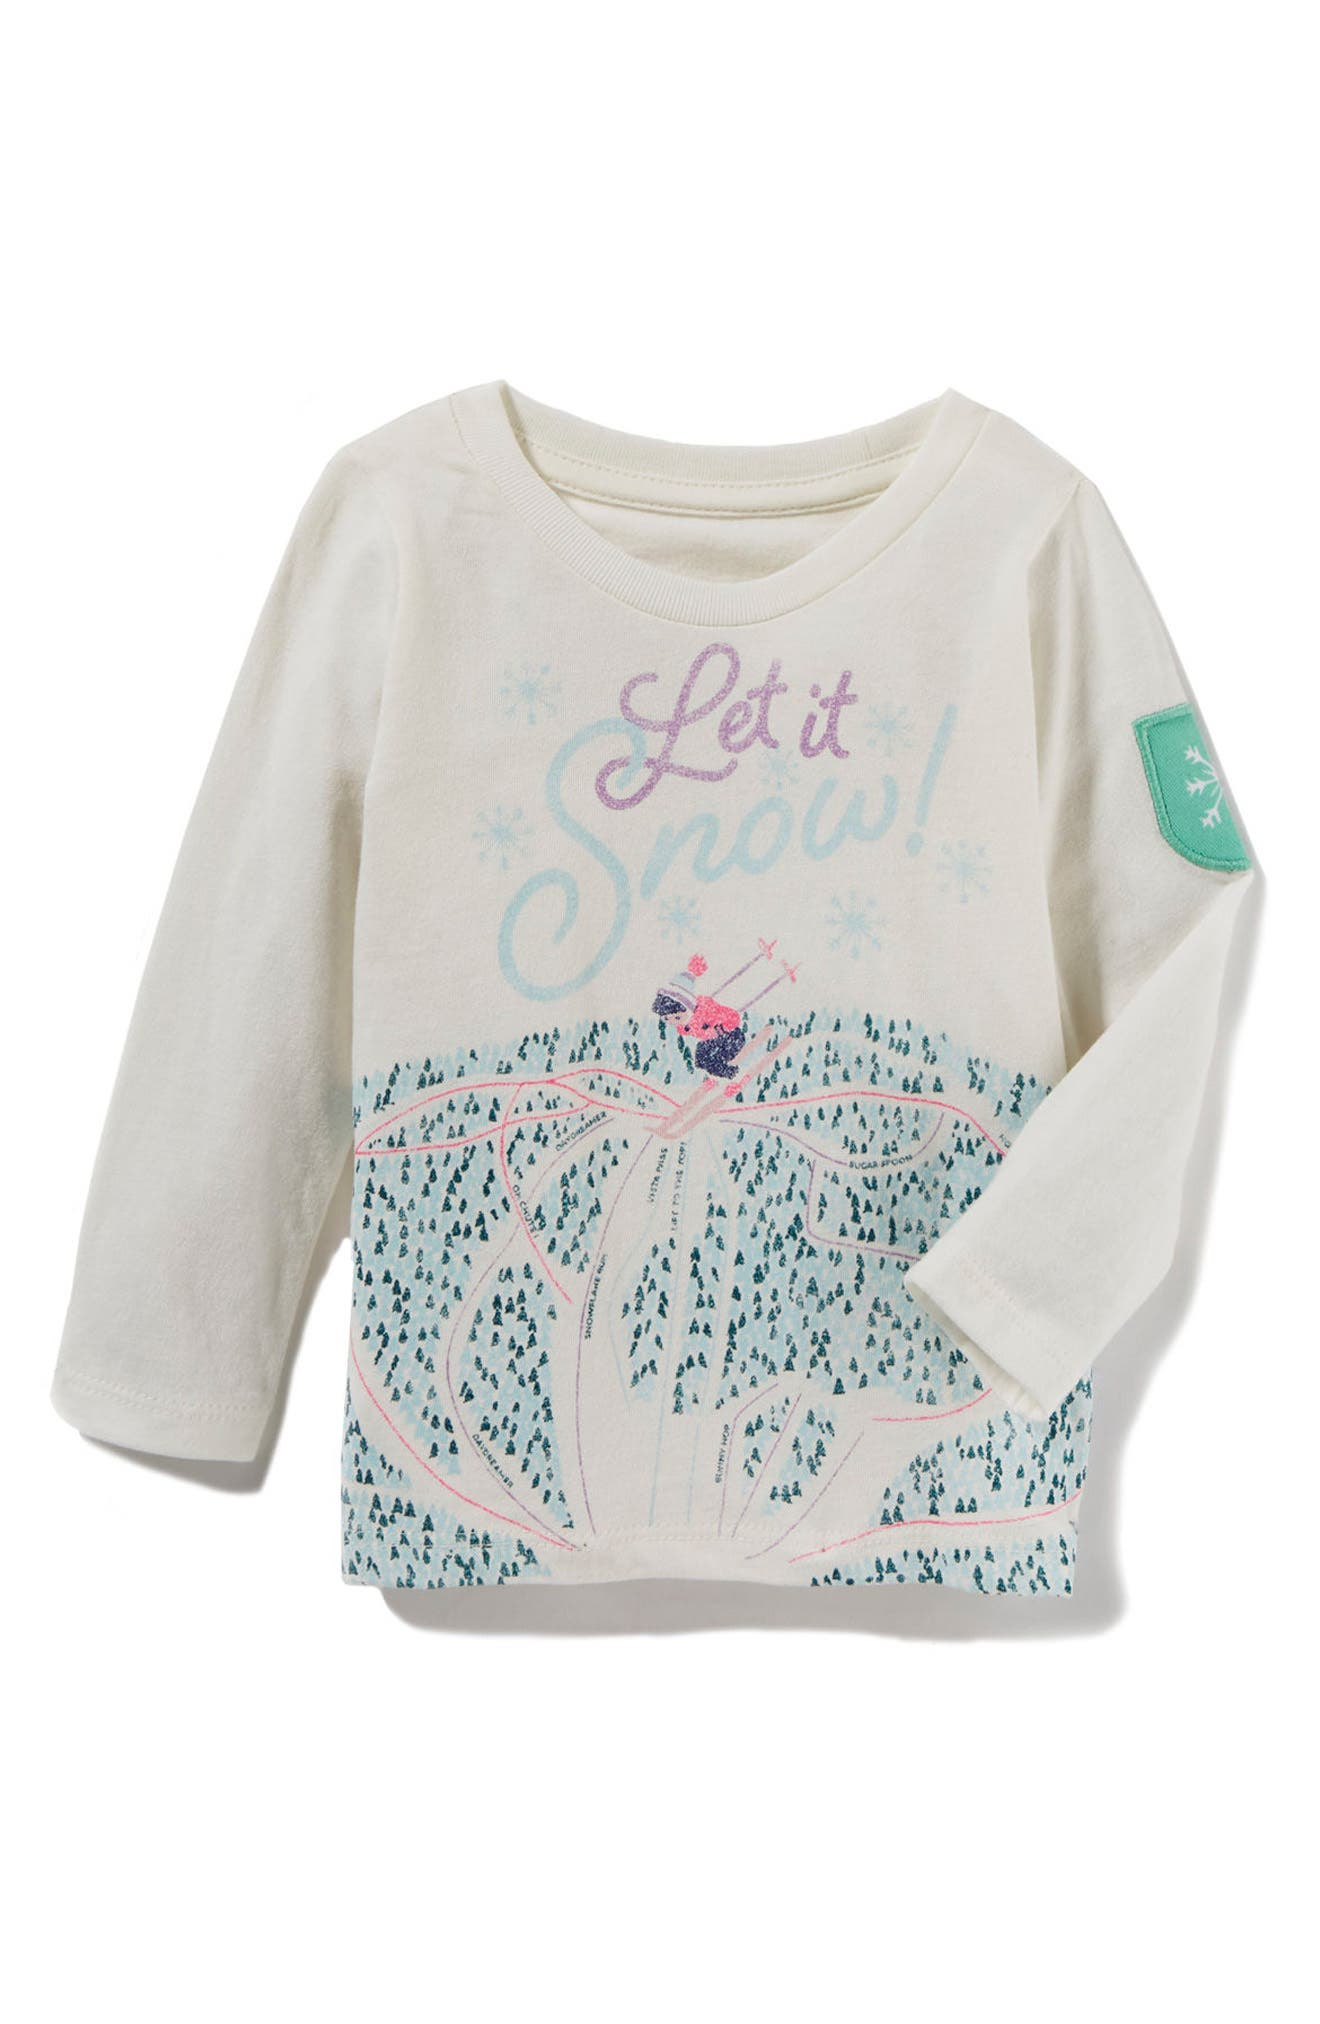 Main Image - Peek Let It Snow Graphic Tee (Baby Girls)